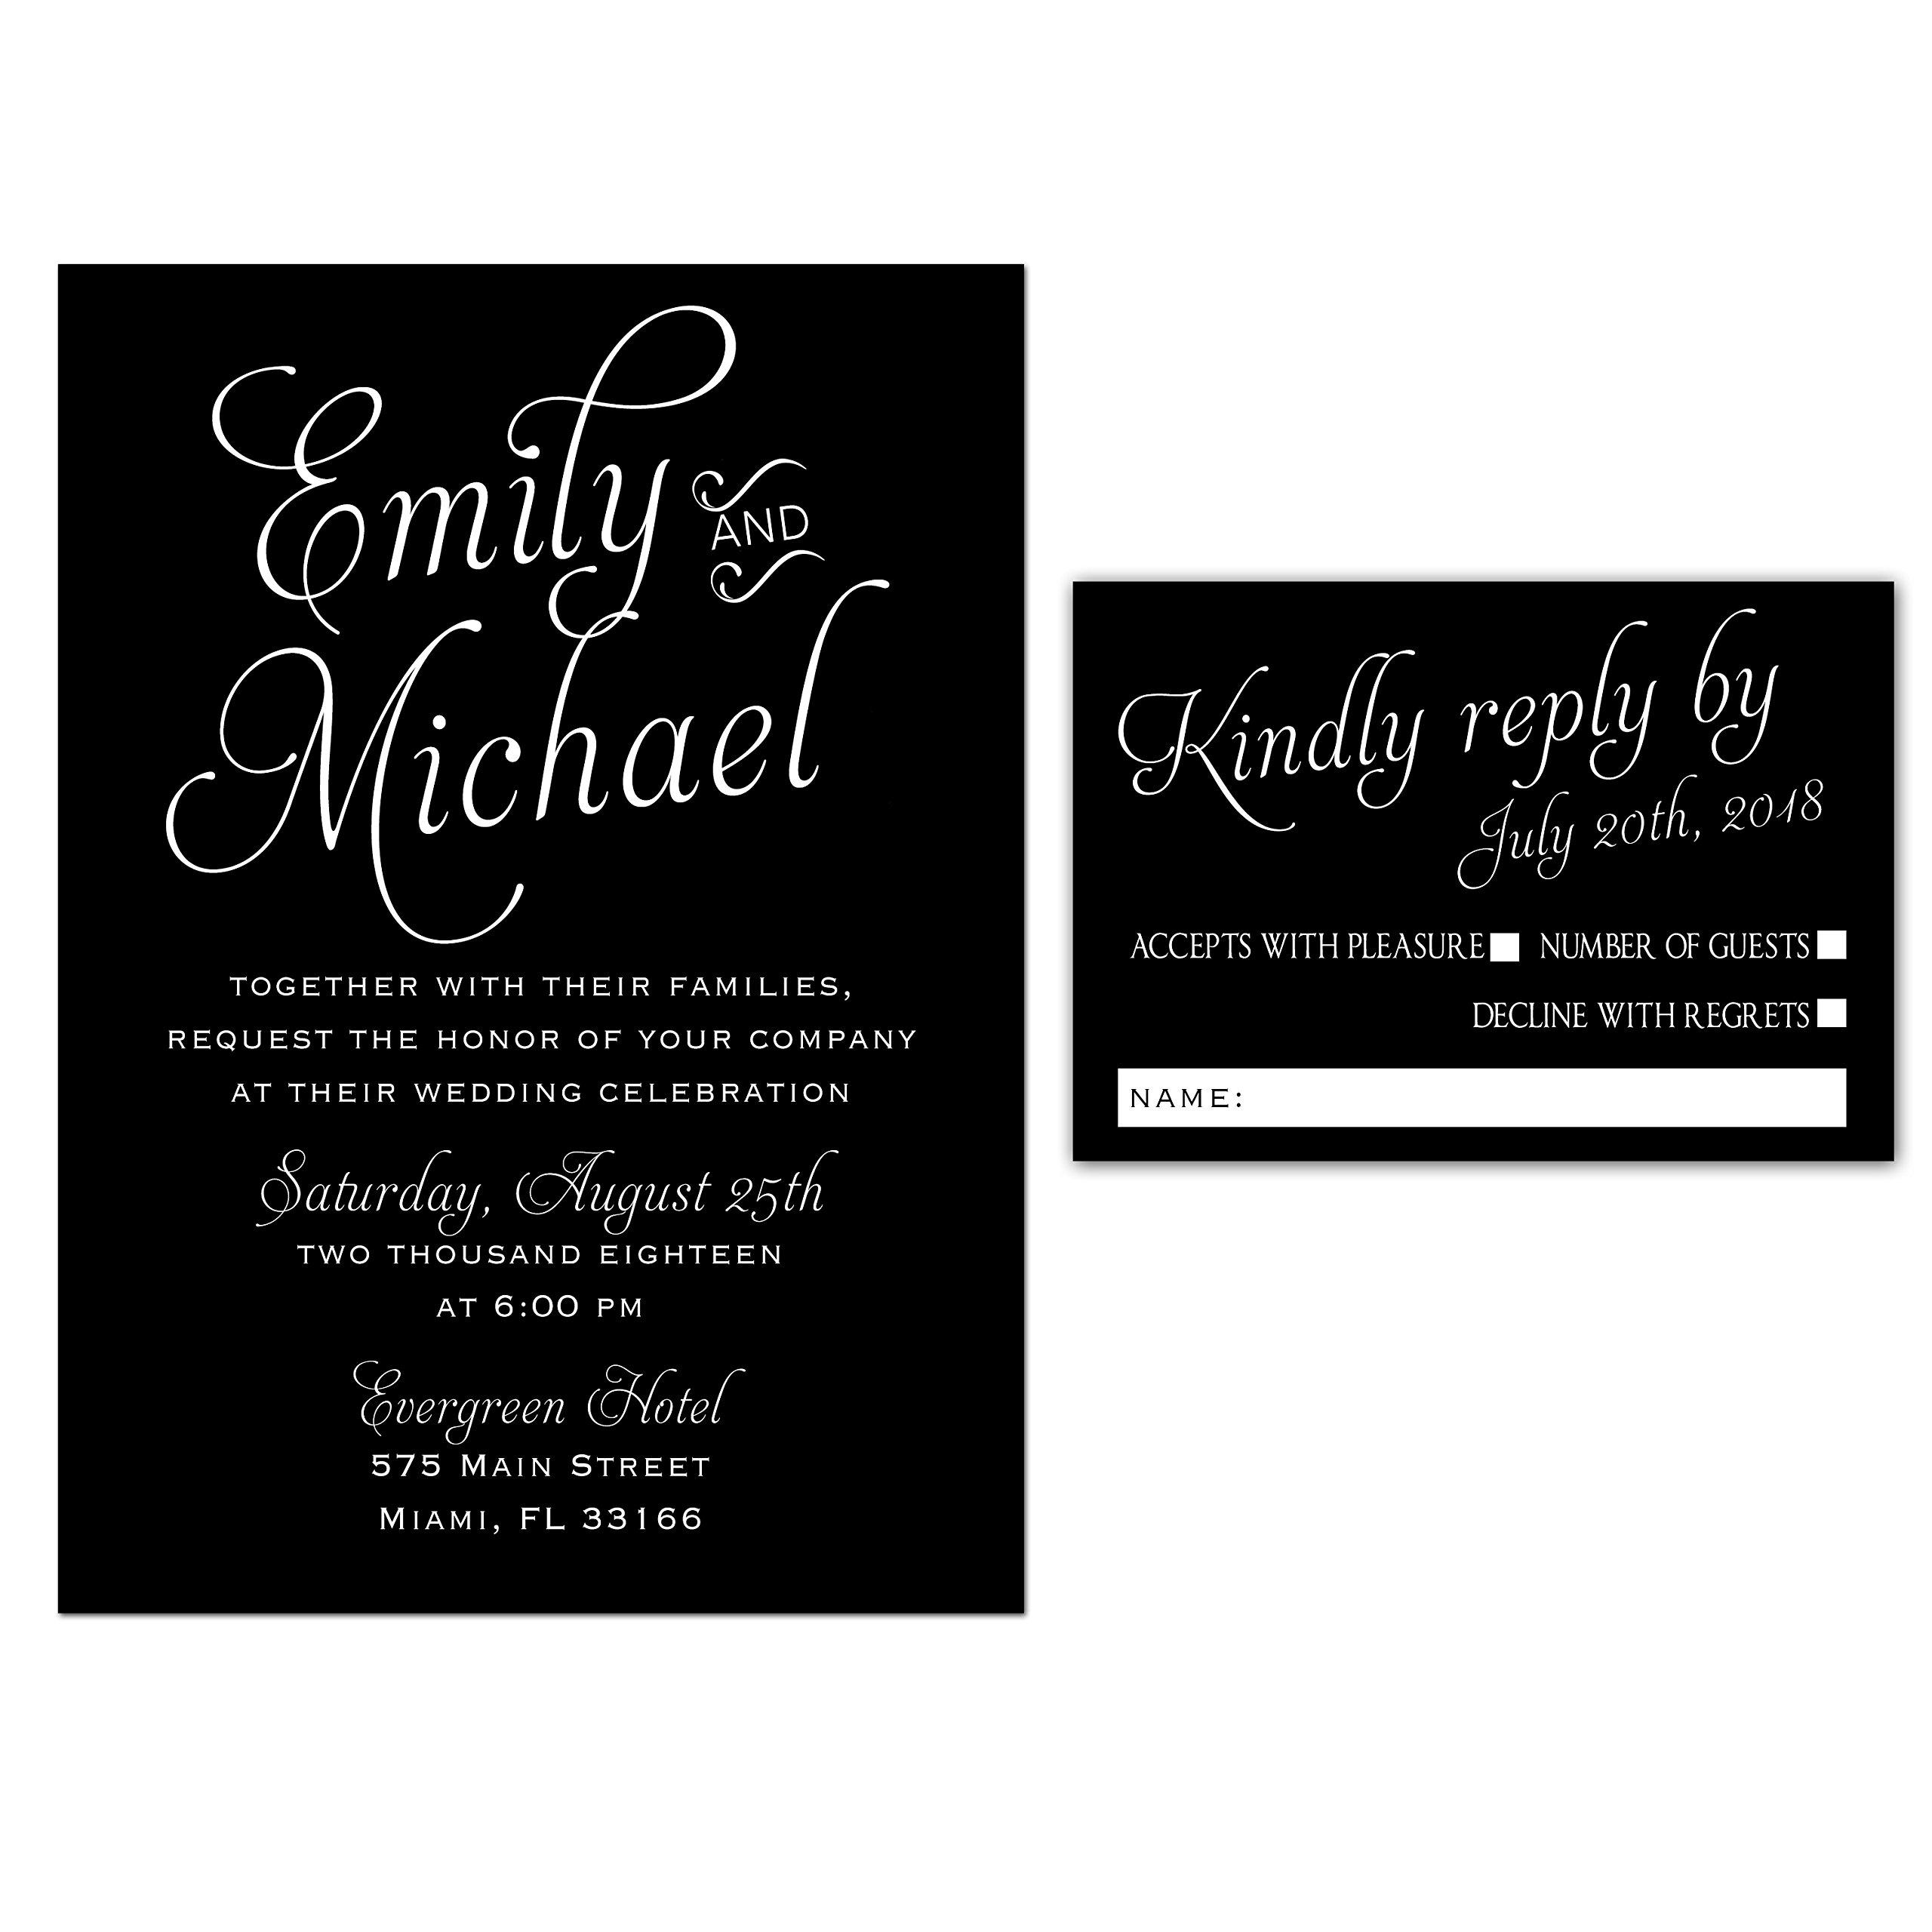 100 Wedding Invitations Black White Gothic Style Elegant Design + Envelopes + Response Cards Set